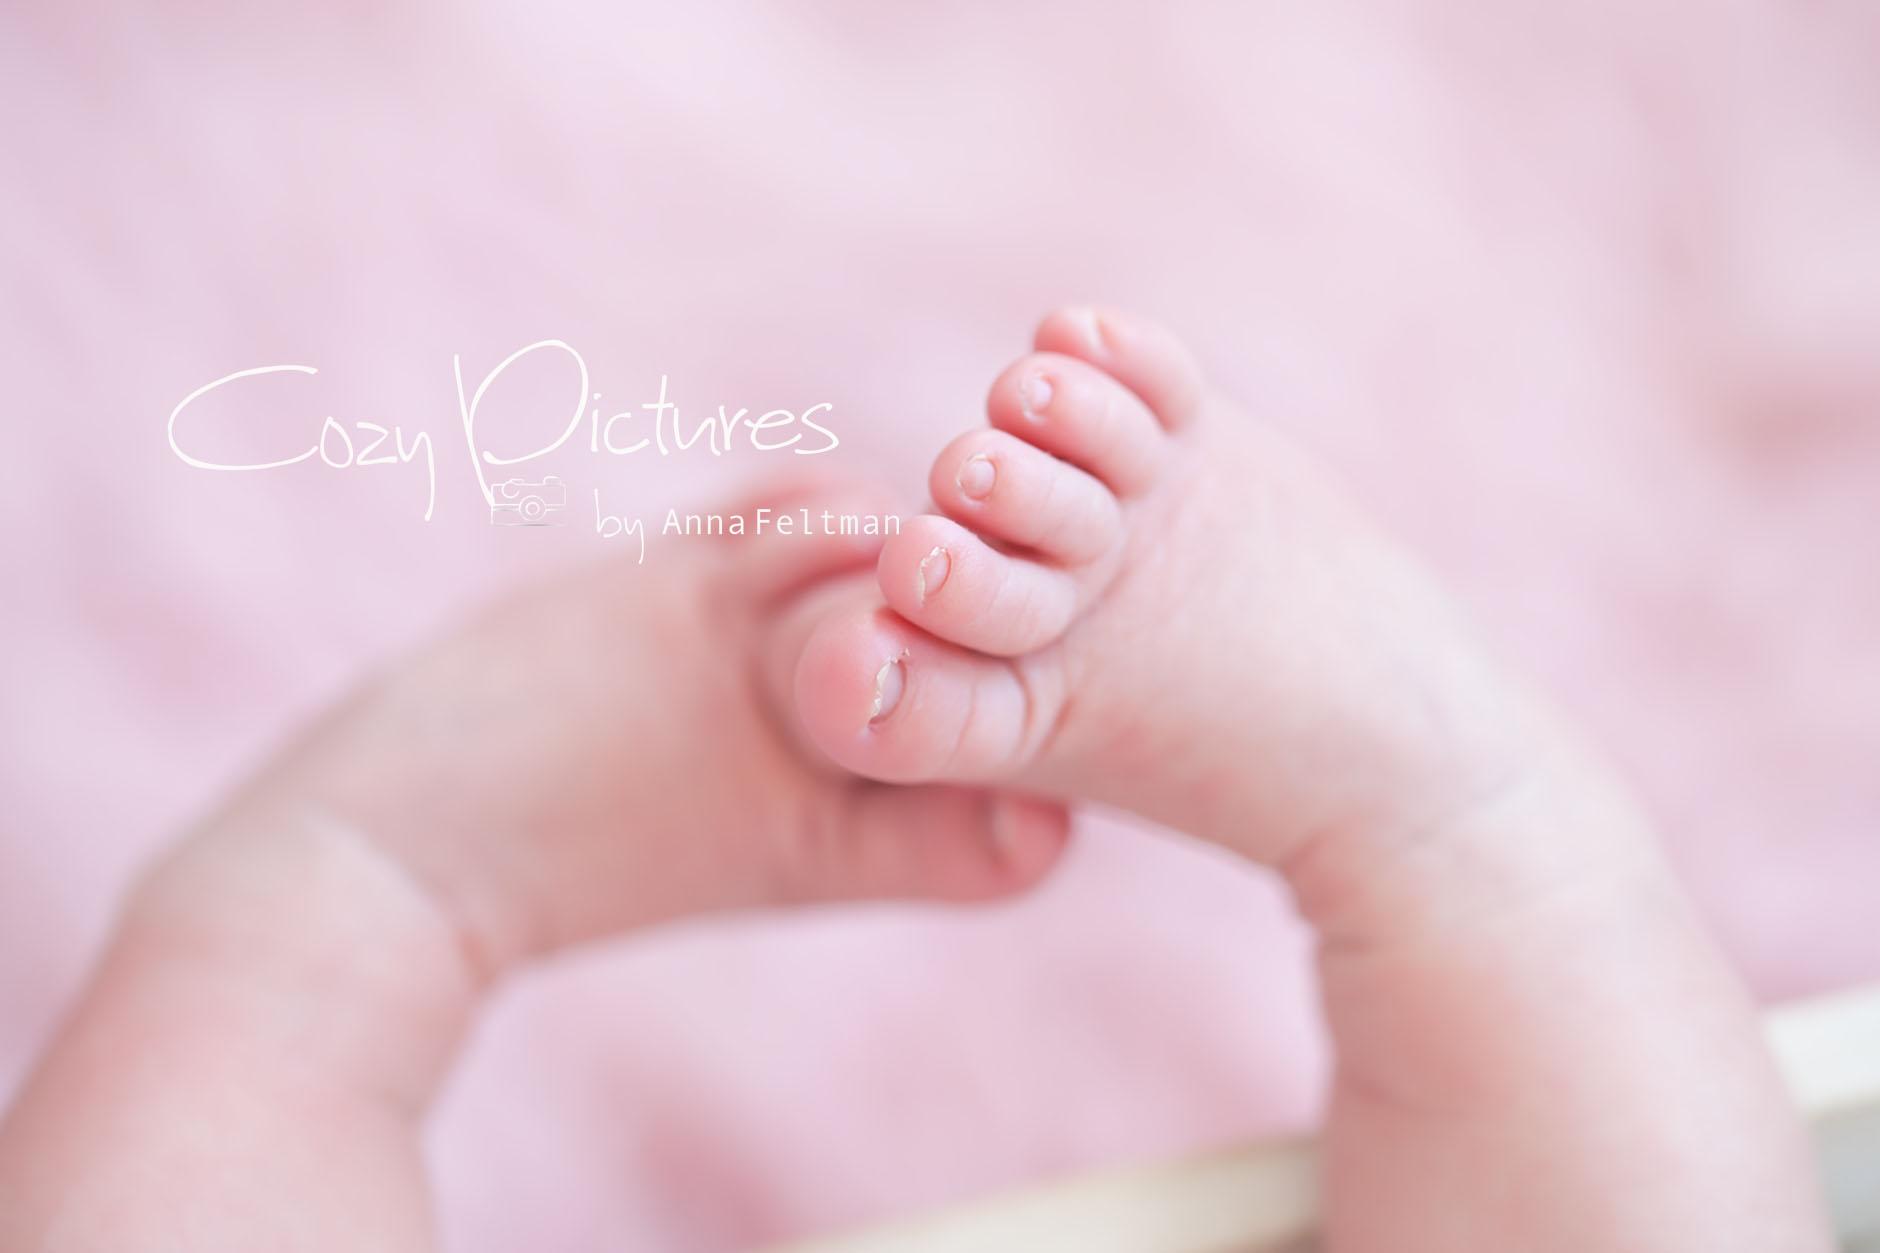 Newborn_Orlando_13_cozy_pictures.jpg